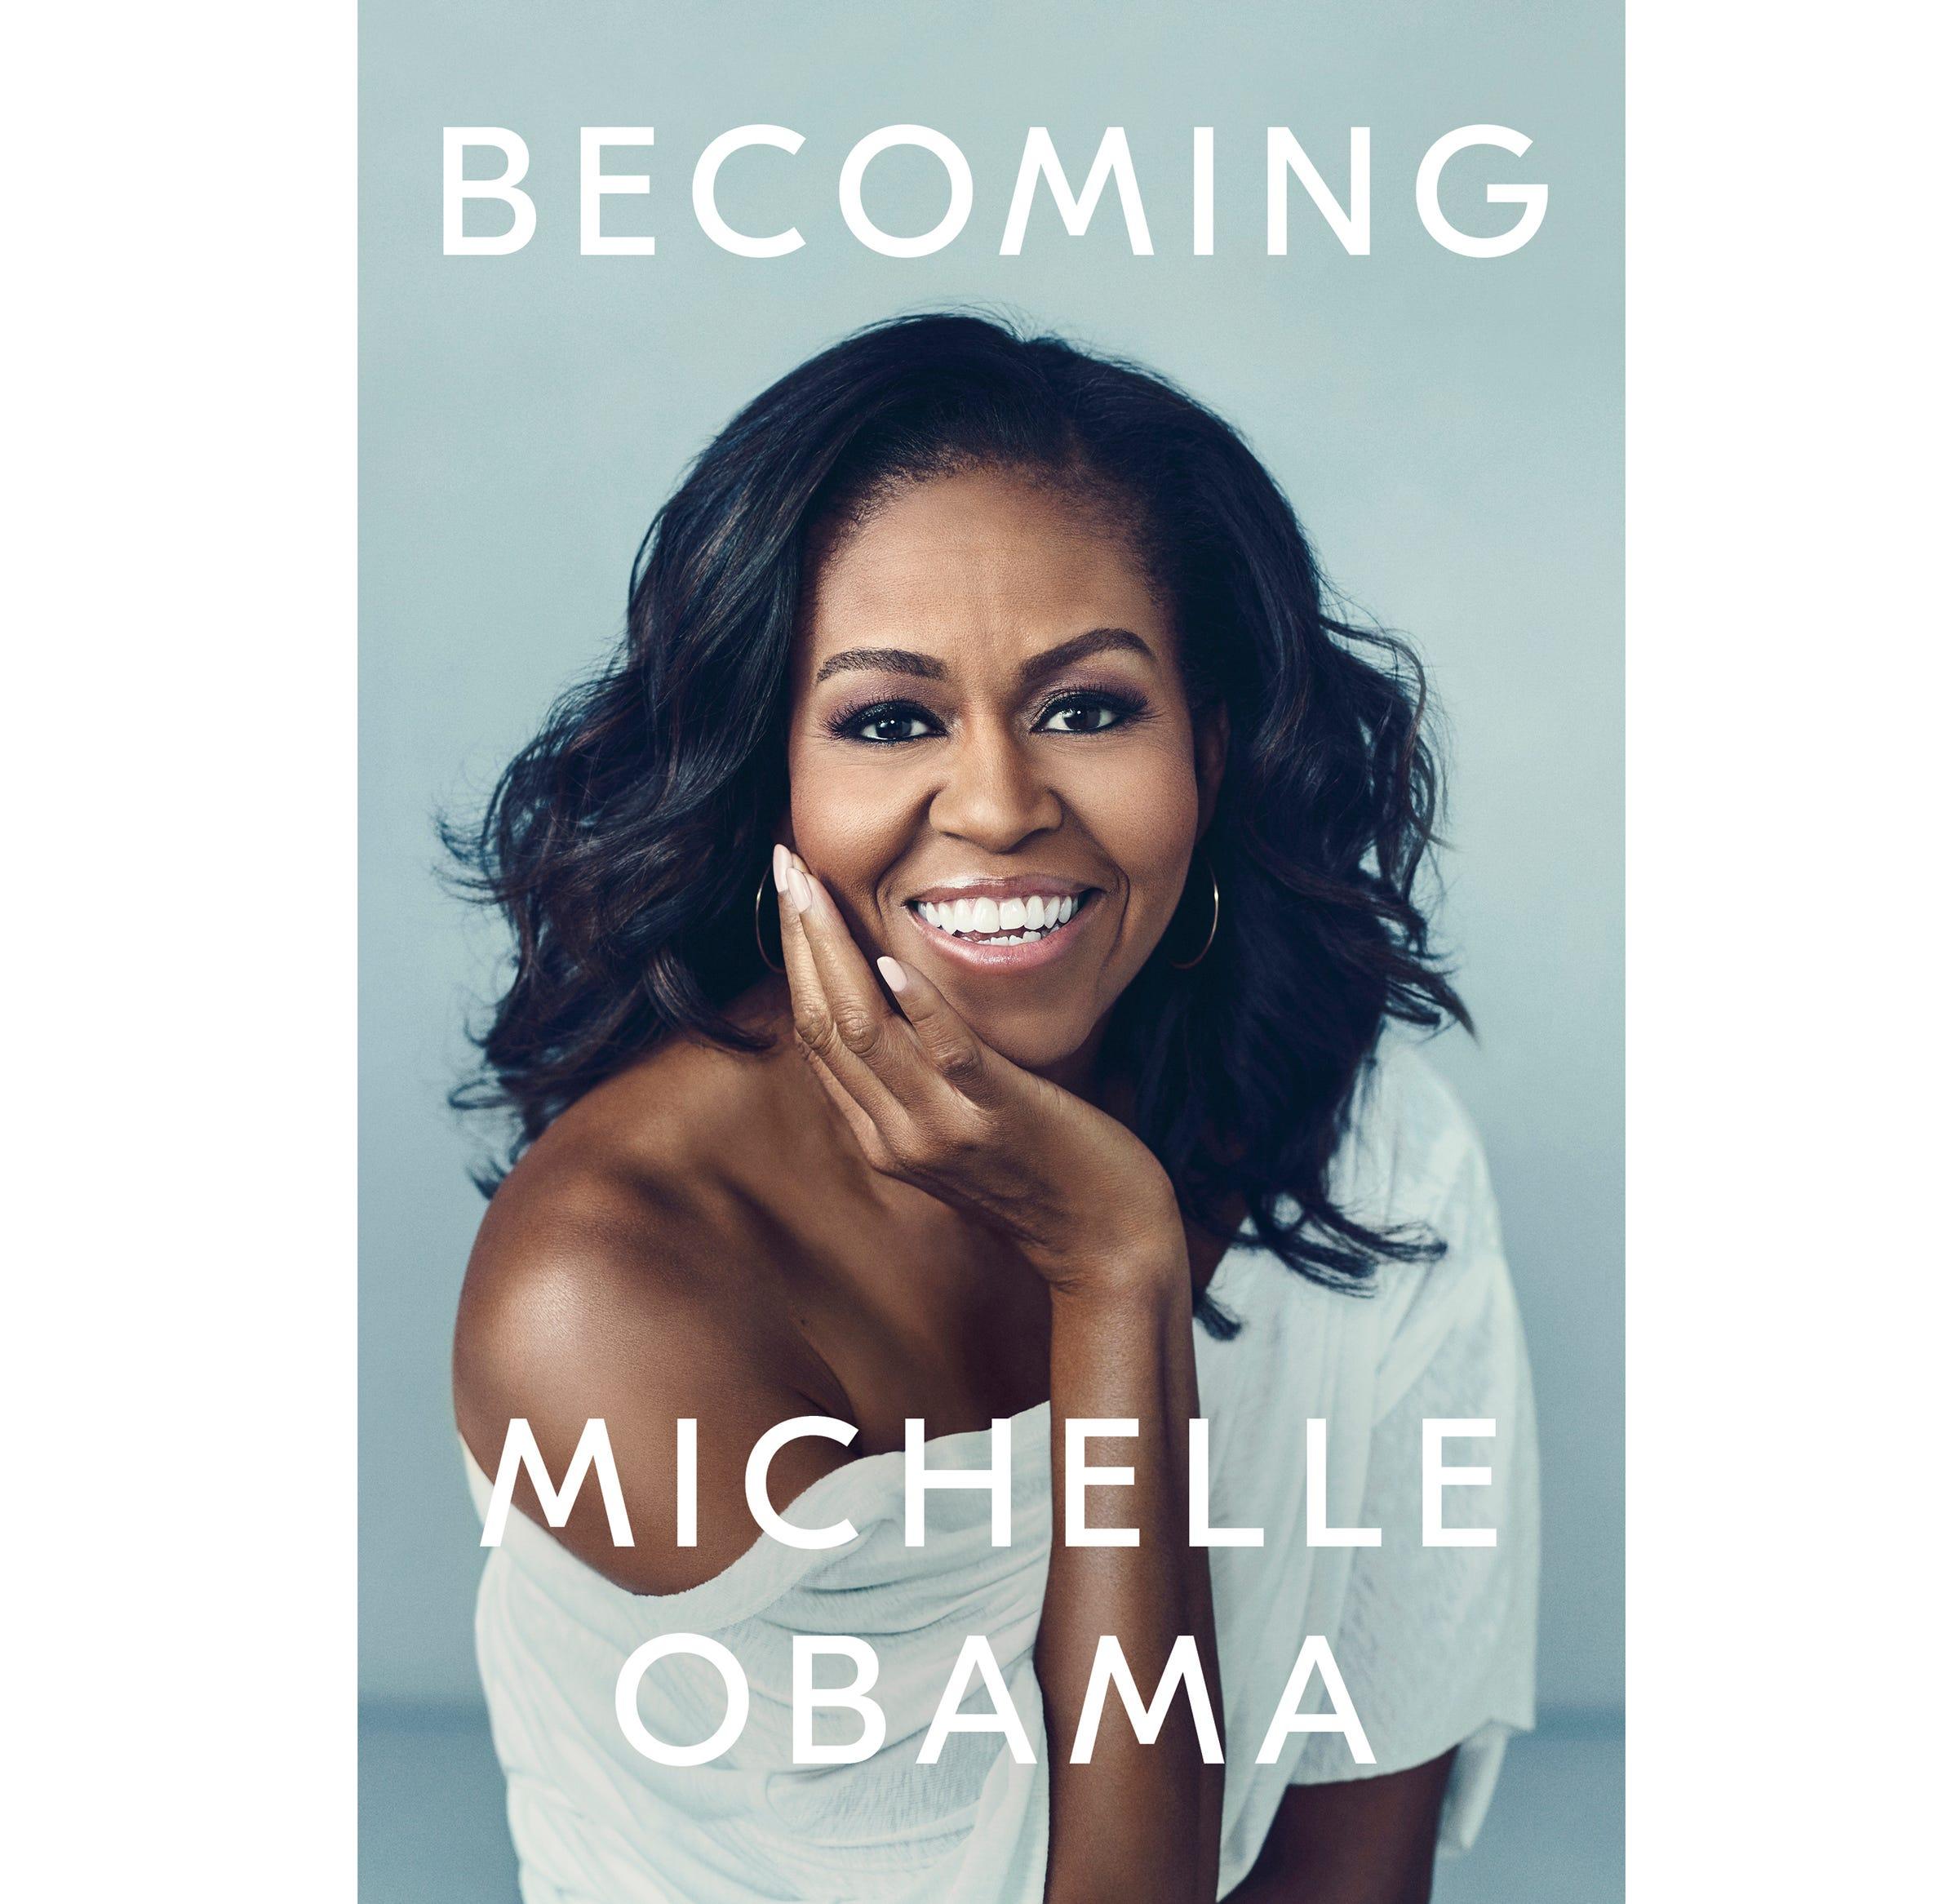 Michelle Obama bringing book tour to Detroit's Little Caesars Arena